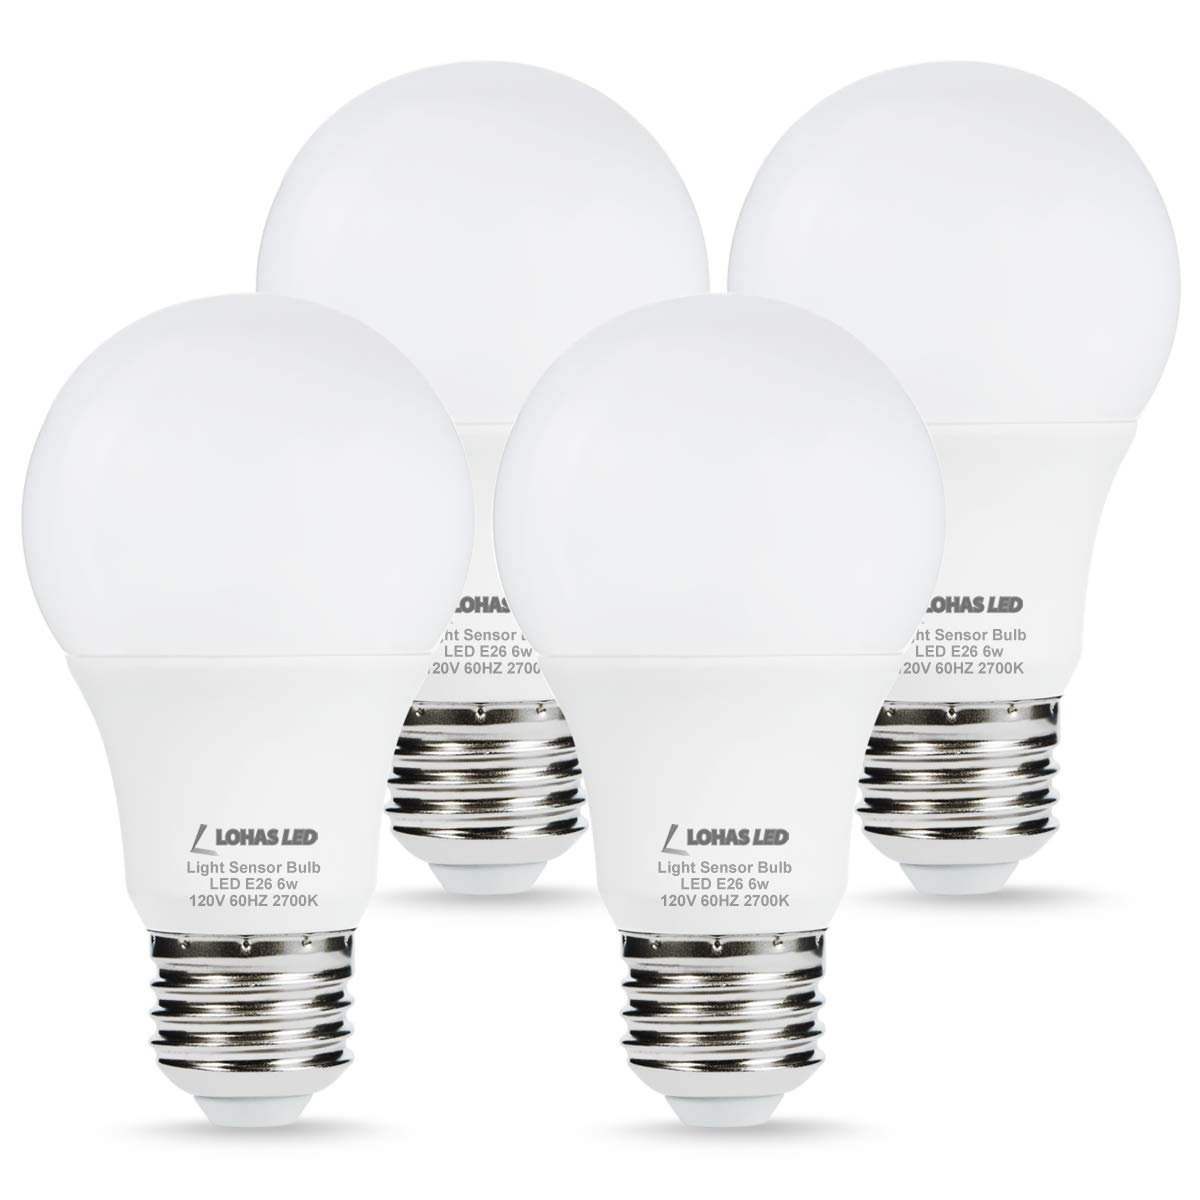 Lohas Led Sensor Light Bulb Dusk To Dawn Front Porch Lights A19 Smart Bulbs 40 Watt Equivalent E26 Base Warm White 2700k Automatic Security